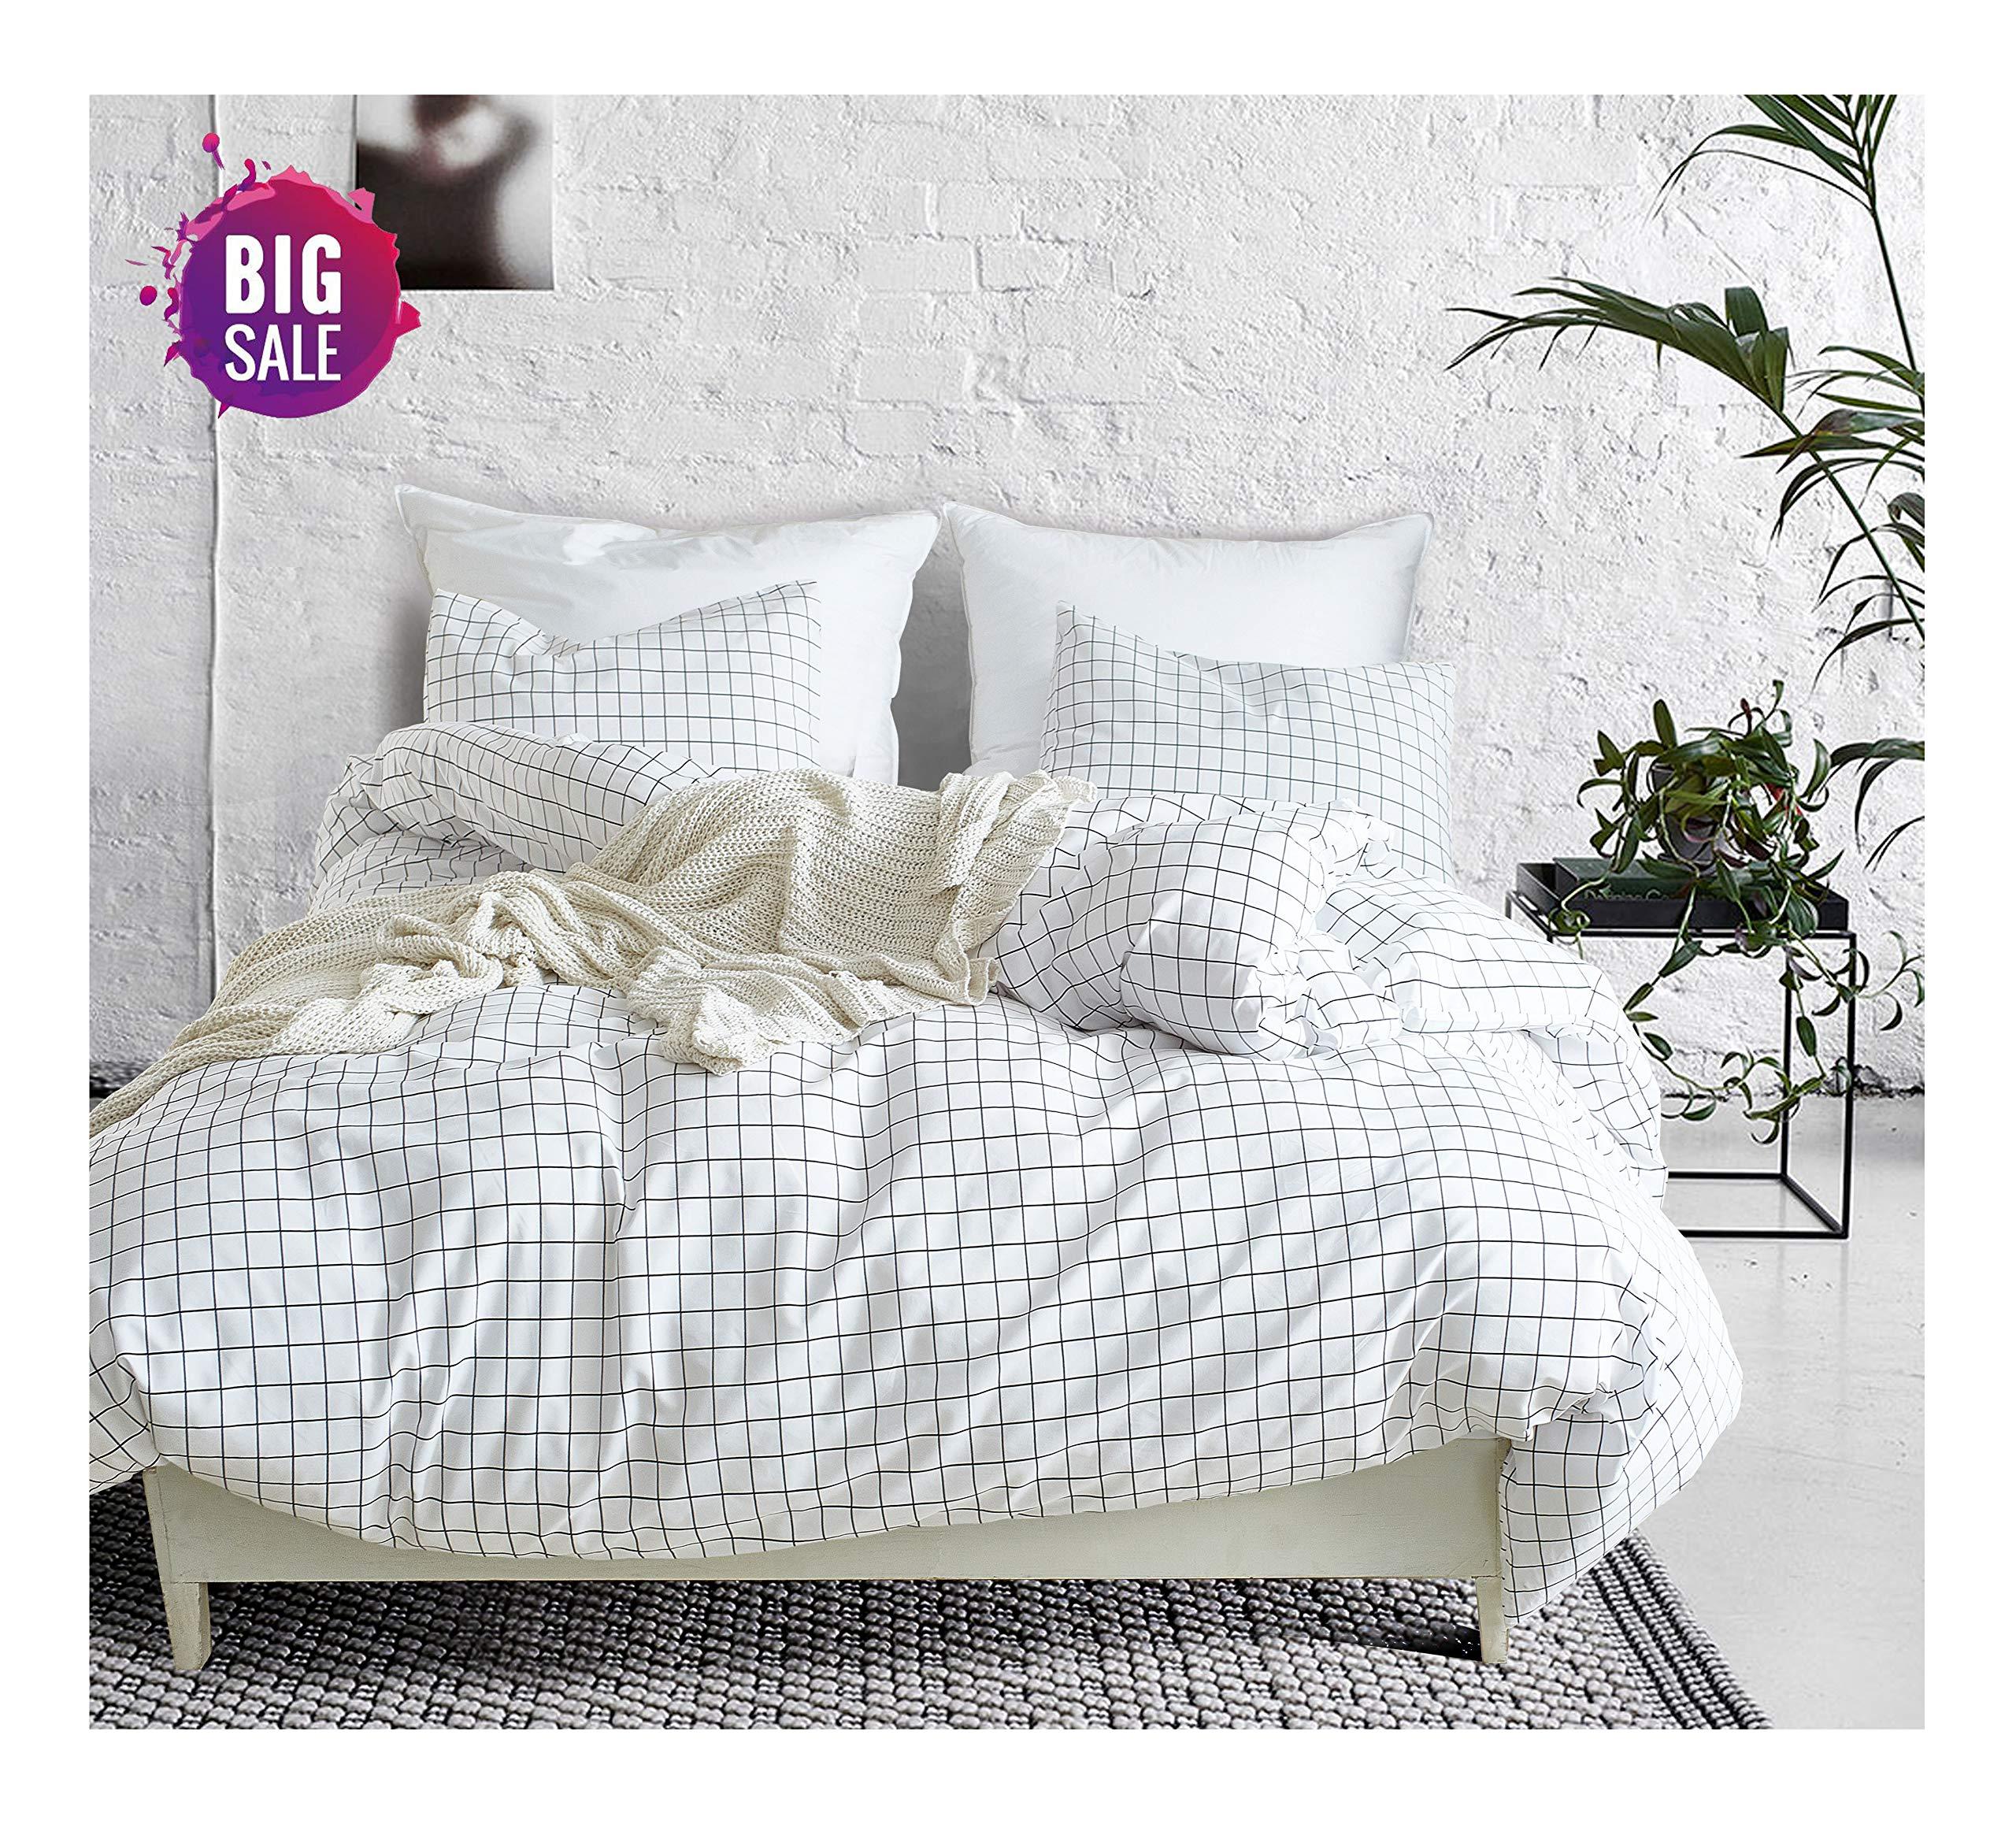 Elephant Soft Duvet Cover Set, Premium Microfiber, Grid Pattern On Comforter Cover-3pcs:1x Duvet Cover 2X Pillowcases,with Zipper Closure (Full/Queen)